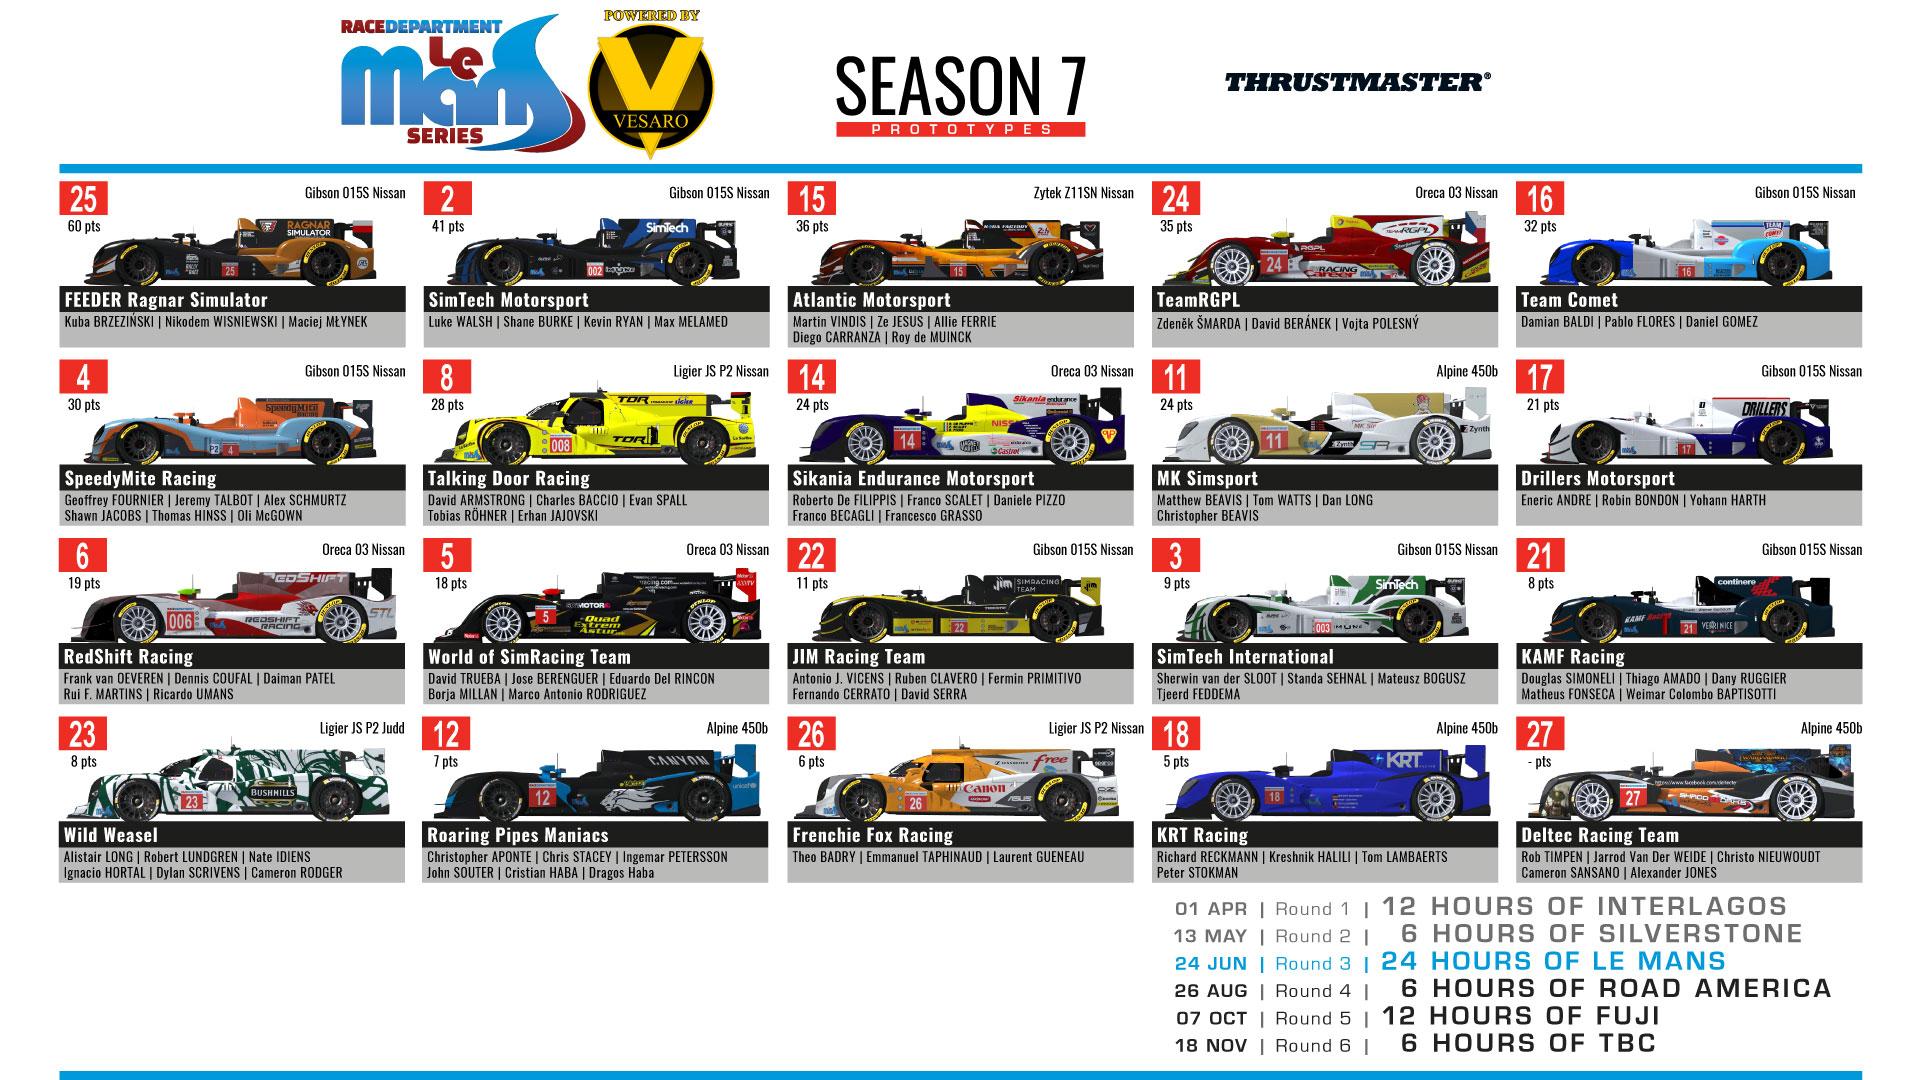 RDLMS by Vesaro Le Mans Spotter Guide - Prototype.jpg